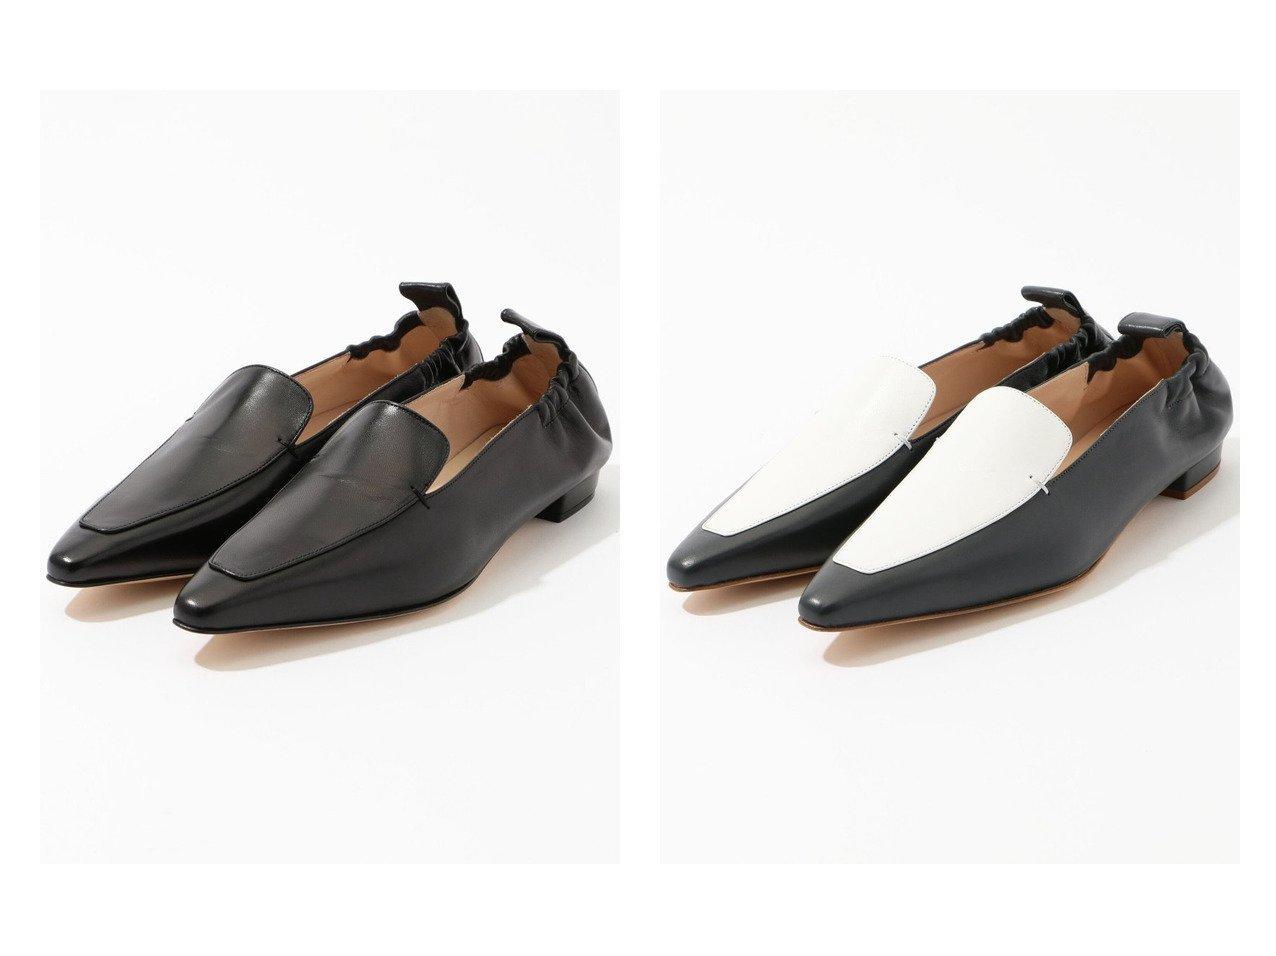 【TOMORROWLAND GOODs/トゥモローランド グッズ】のNEBULONIE セミスクエアフラットシューズ&NEBULONIE バイカラーフラットシューズ シューズ・靴のおすすめ!人気、トレンド・レディースファッションの通販 おすすめで人気の流行・トレンド、ファッションの通販商品 メンズファッション・キッズファッション・インテリア・家具・レディースファッション・服の通販 founy(ファニー) https://founy.com/ ファッション Fashion レディースファッション WOMEN NEW・新作・新着・新入荷 New Arrivals シューズ ハンド フラット |ID:crp329100000009779